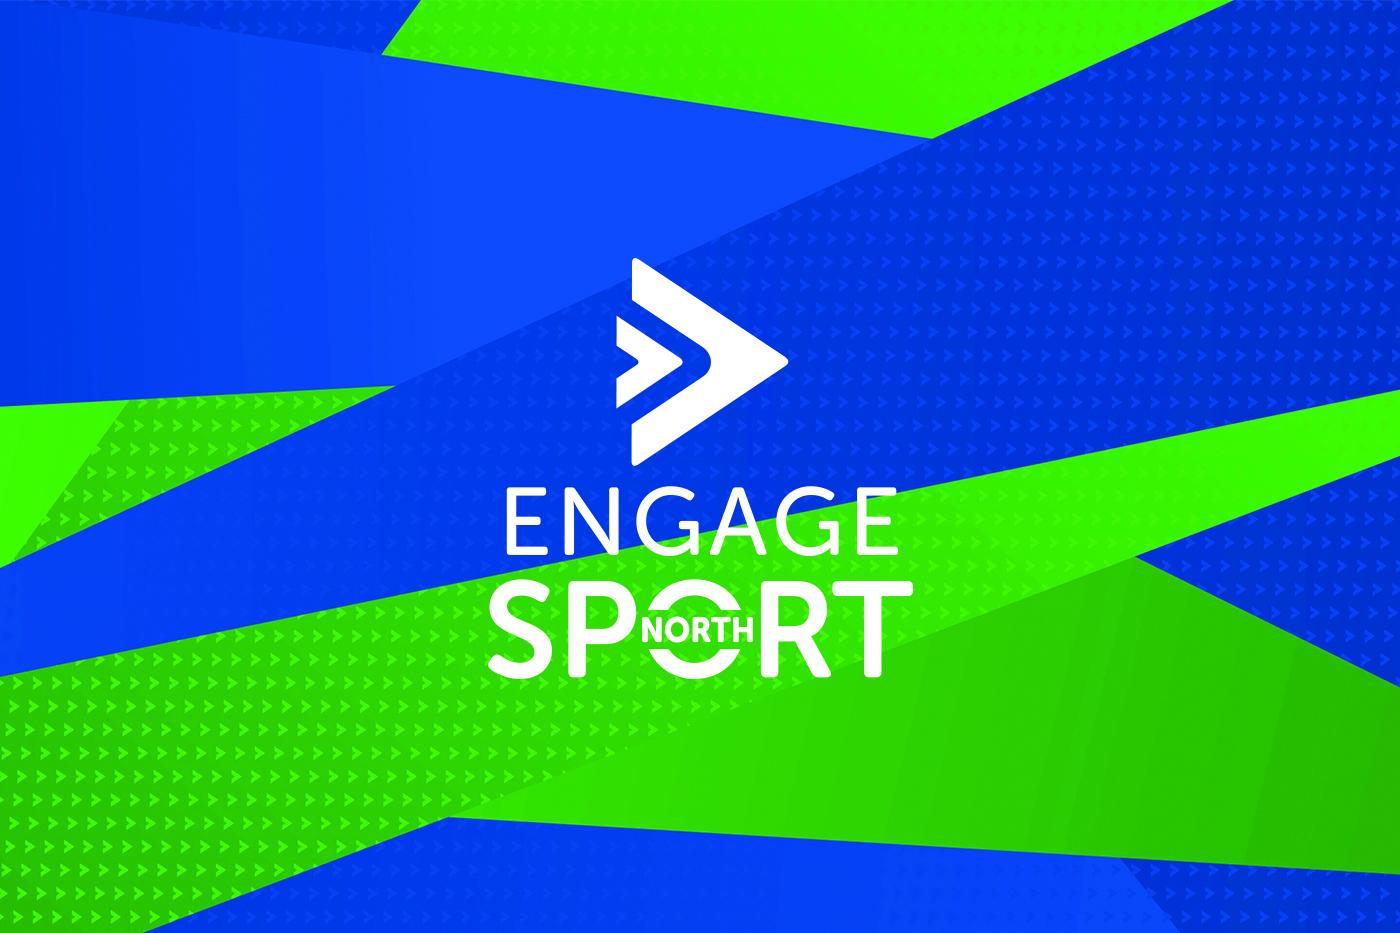 Engage-Sport-North-logo-brand-design.jpg